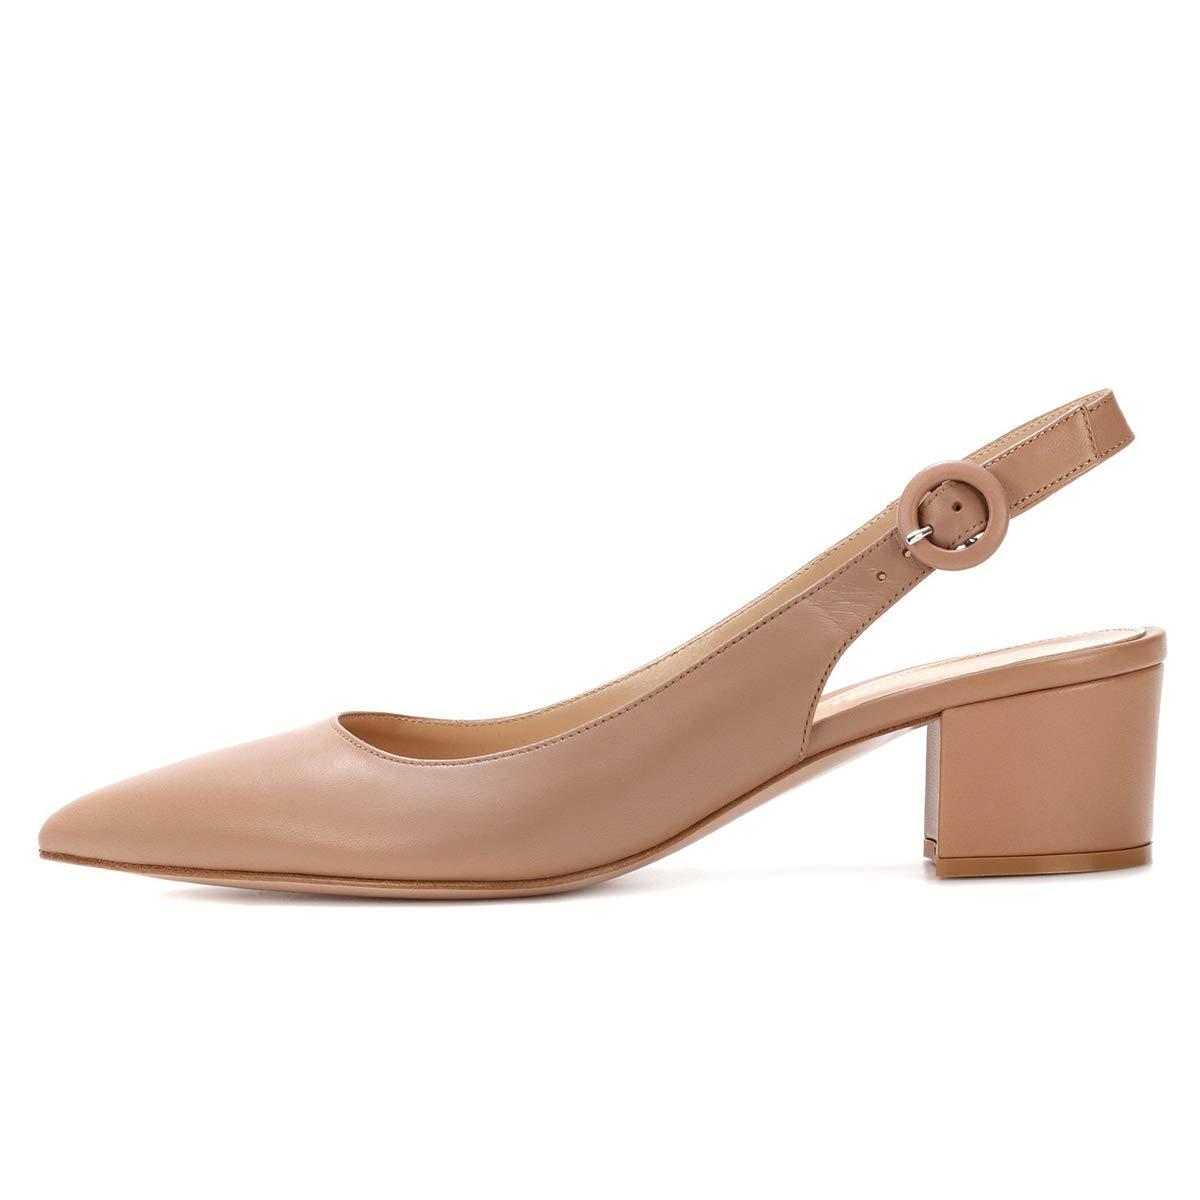 XYD Women Low Block Heel Pumps Pointed Toe Buckle Sandals Slingback Slip On Office Ladies Dress Shoes